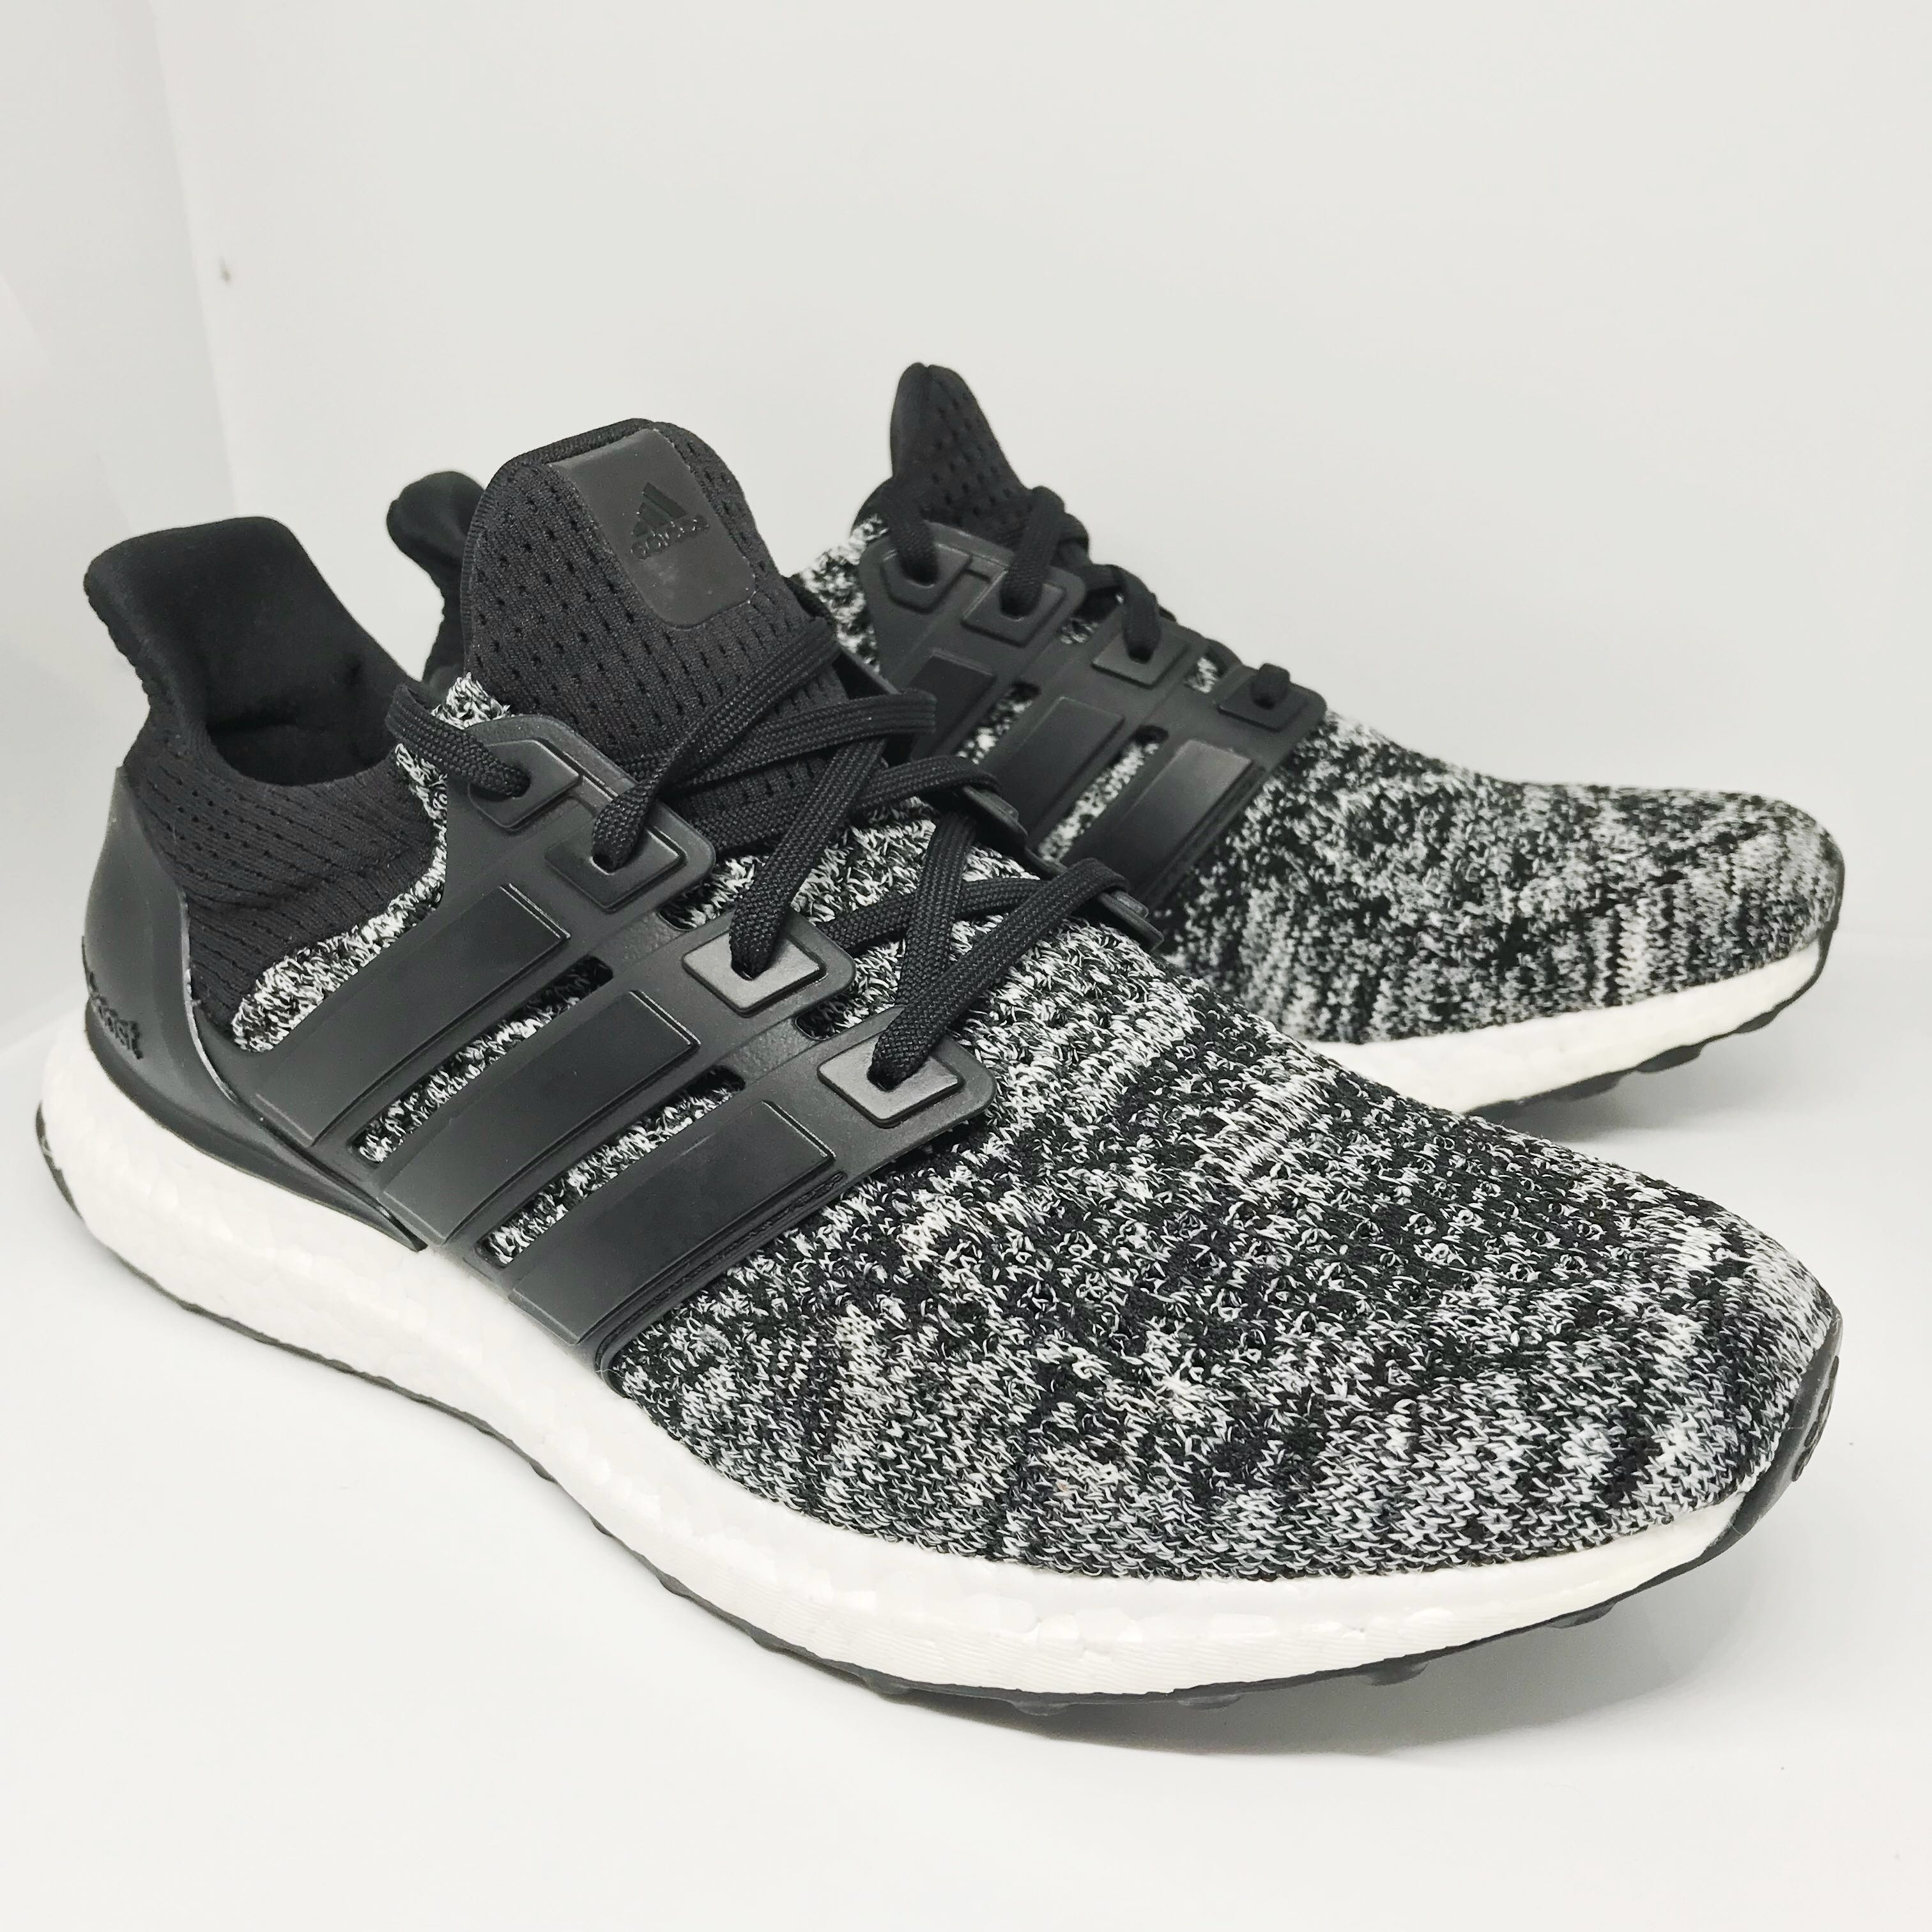 49cbfbcb22454 Adidas Ultra Boost 1.0 Reigning Champ